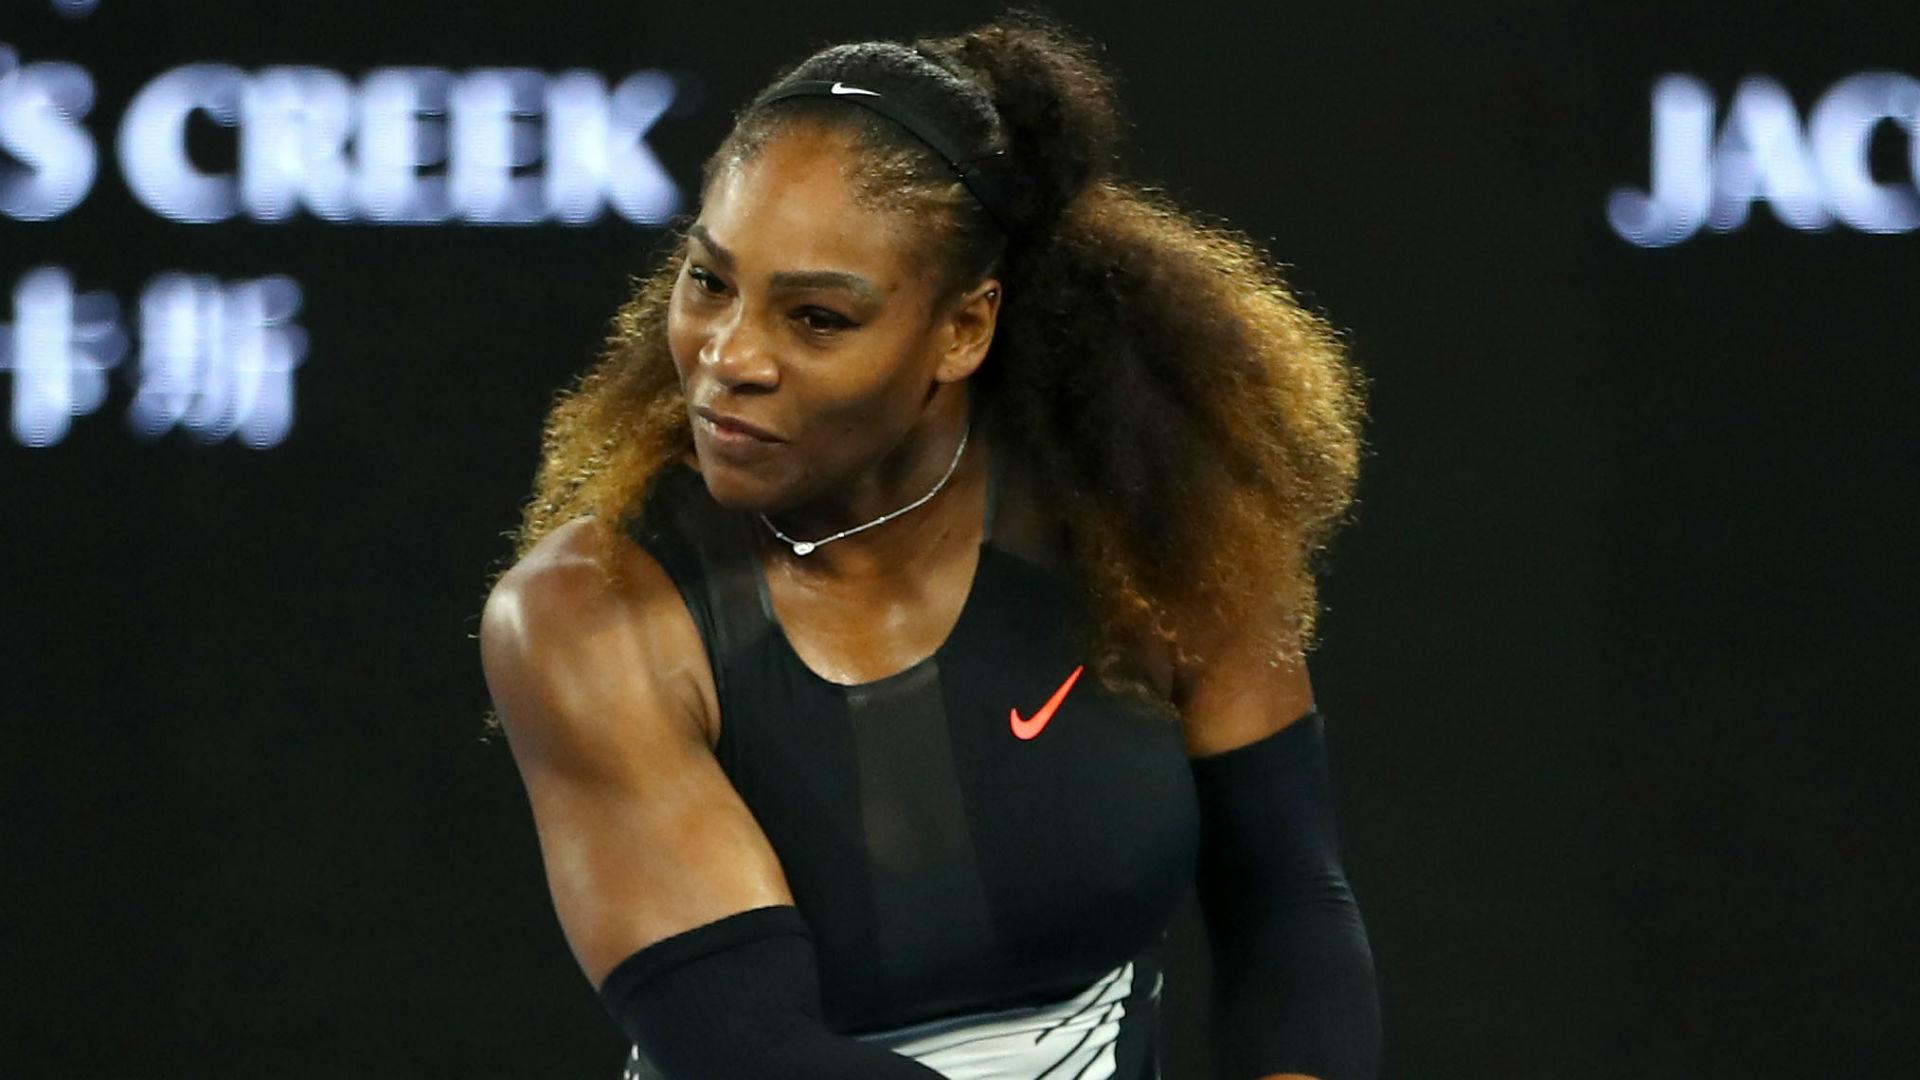 Serena Williams Clarifies Baby Gender Reveal From Sister Venus